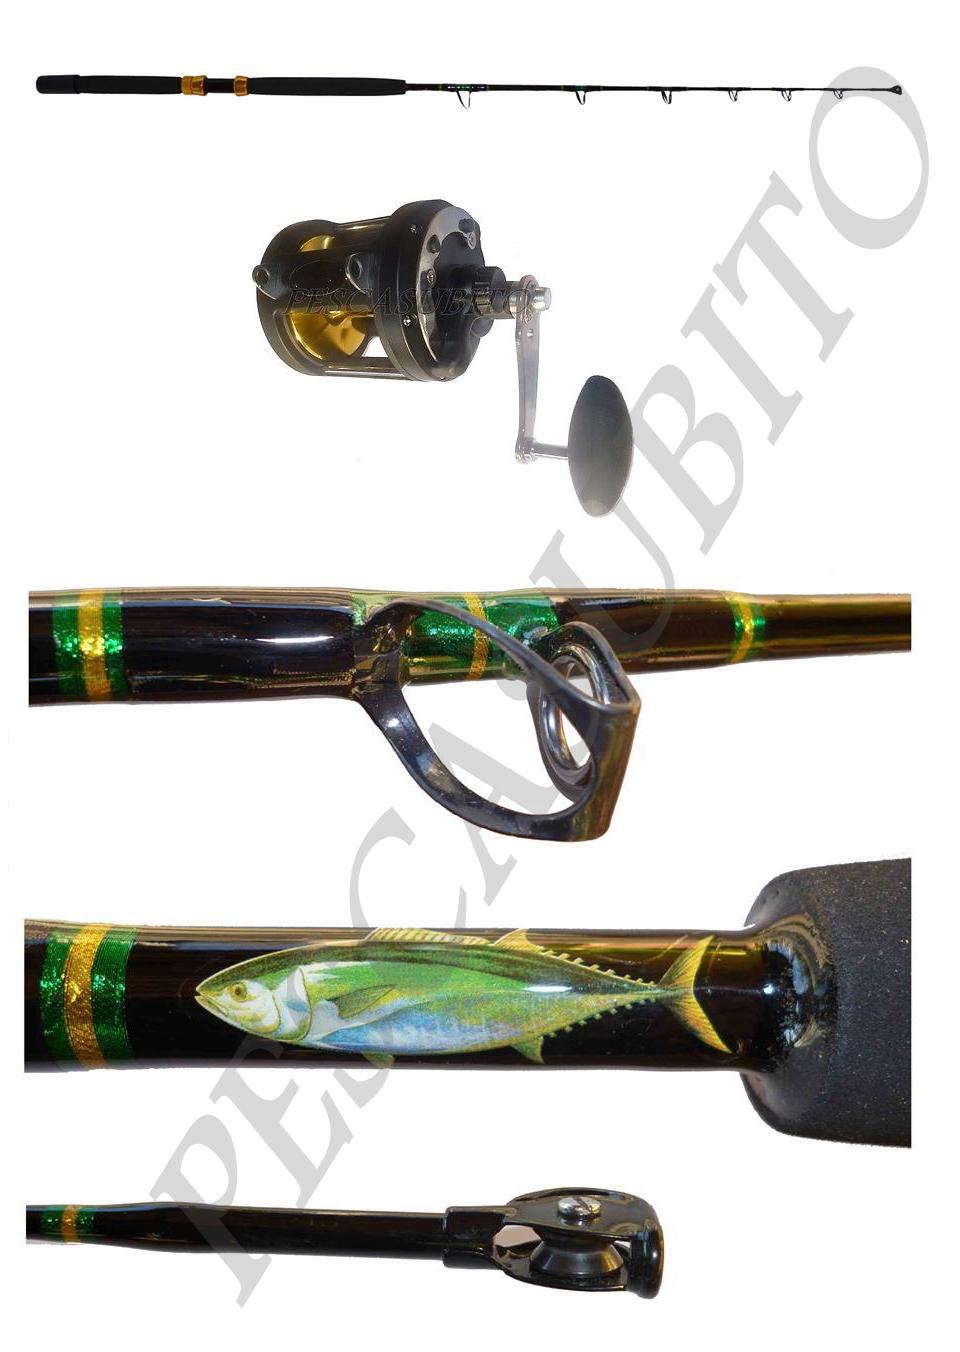 Kit canna traina biggame biggame biggame drifting tonno 30-60lb + mulinello pesca tp d85579